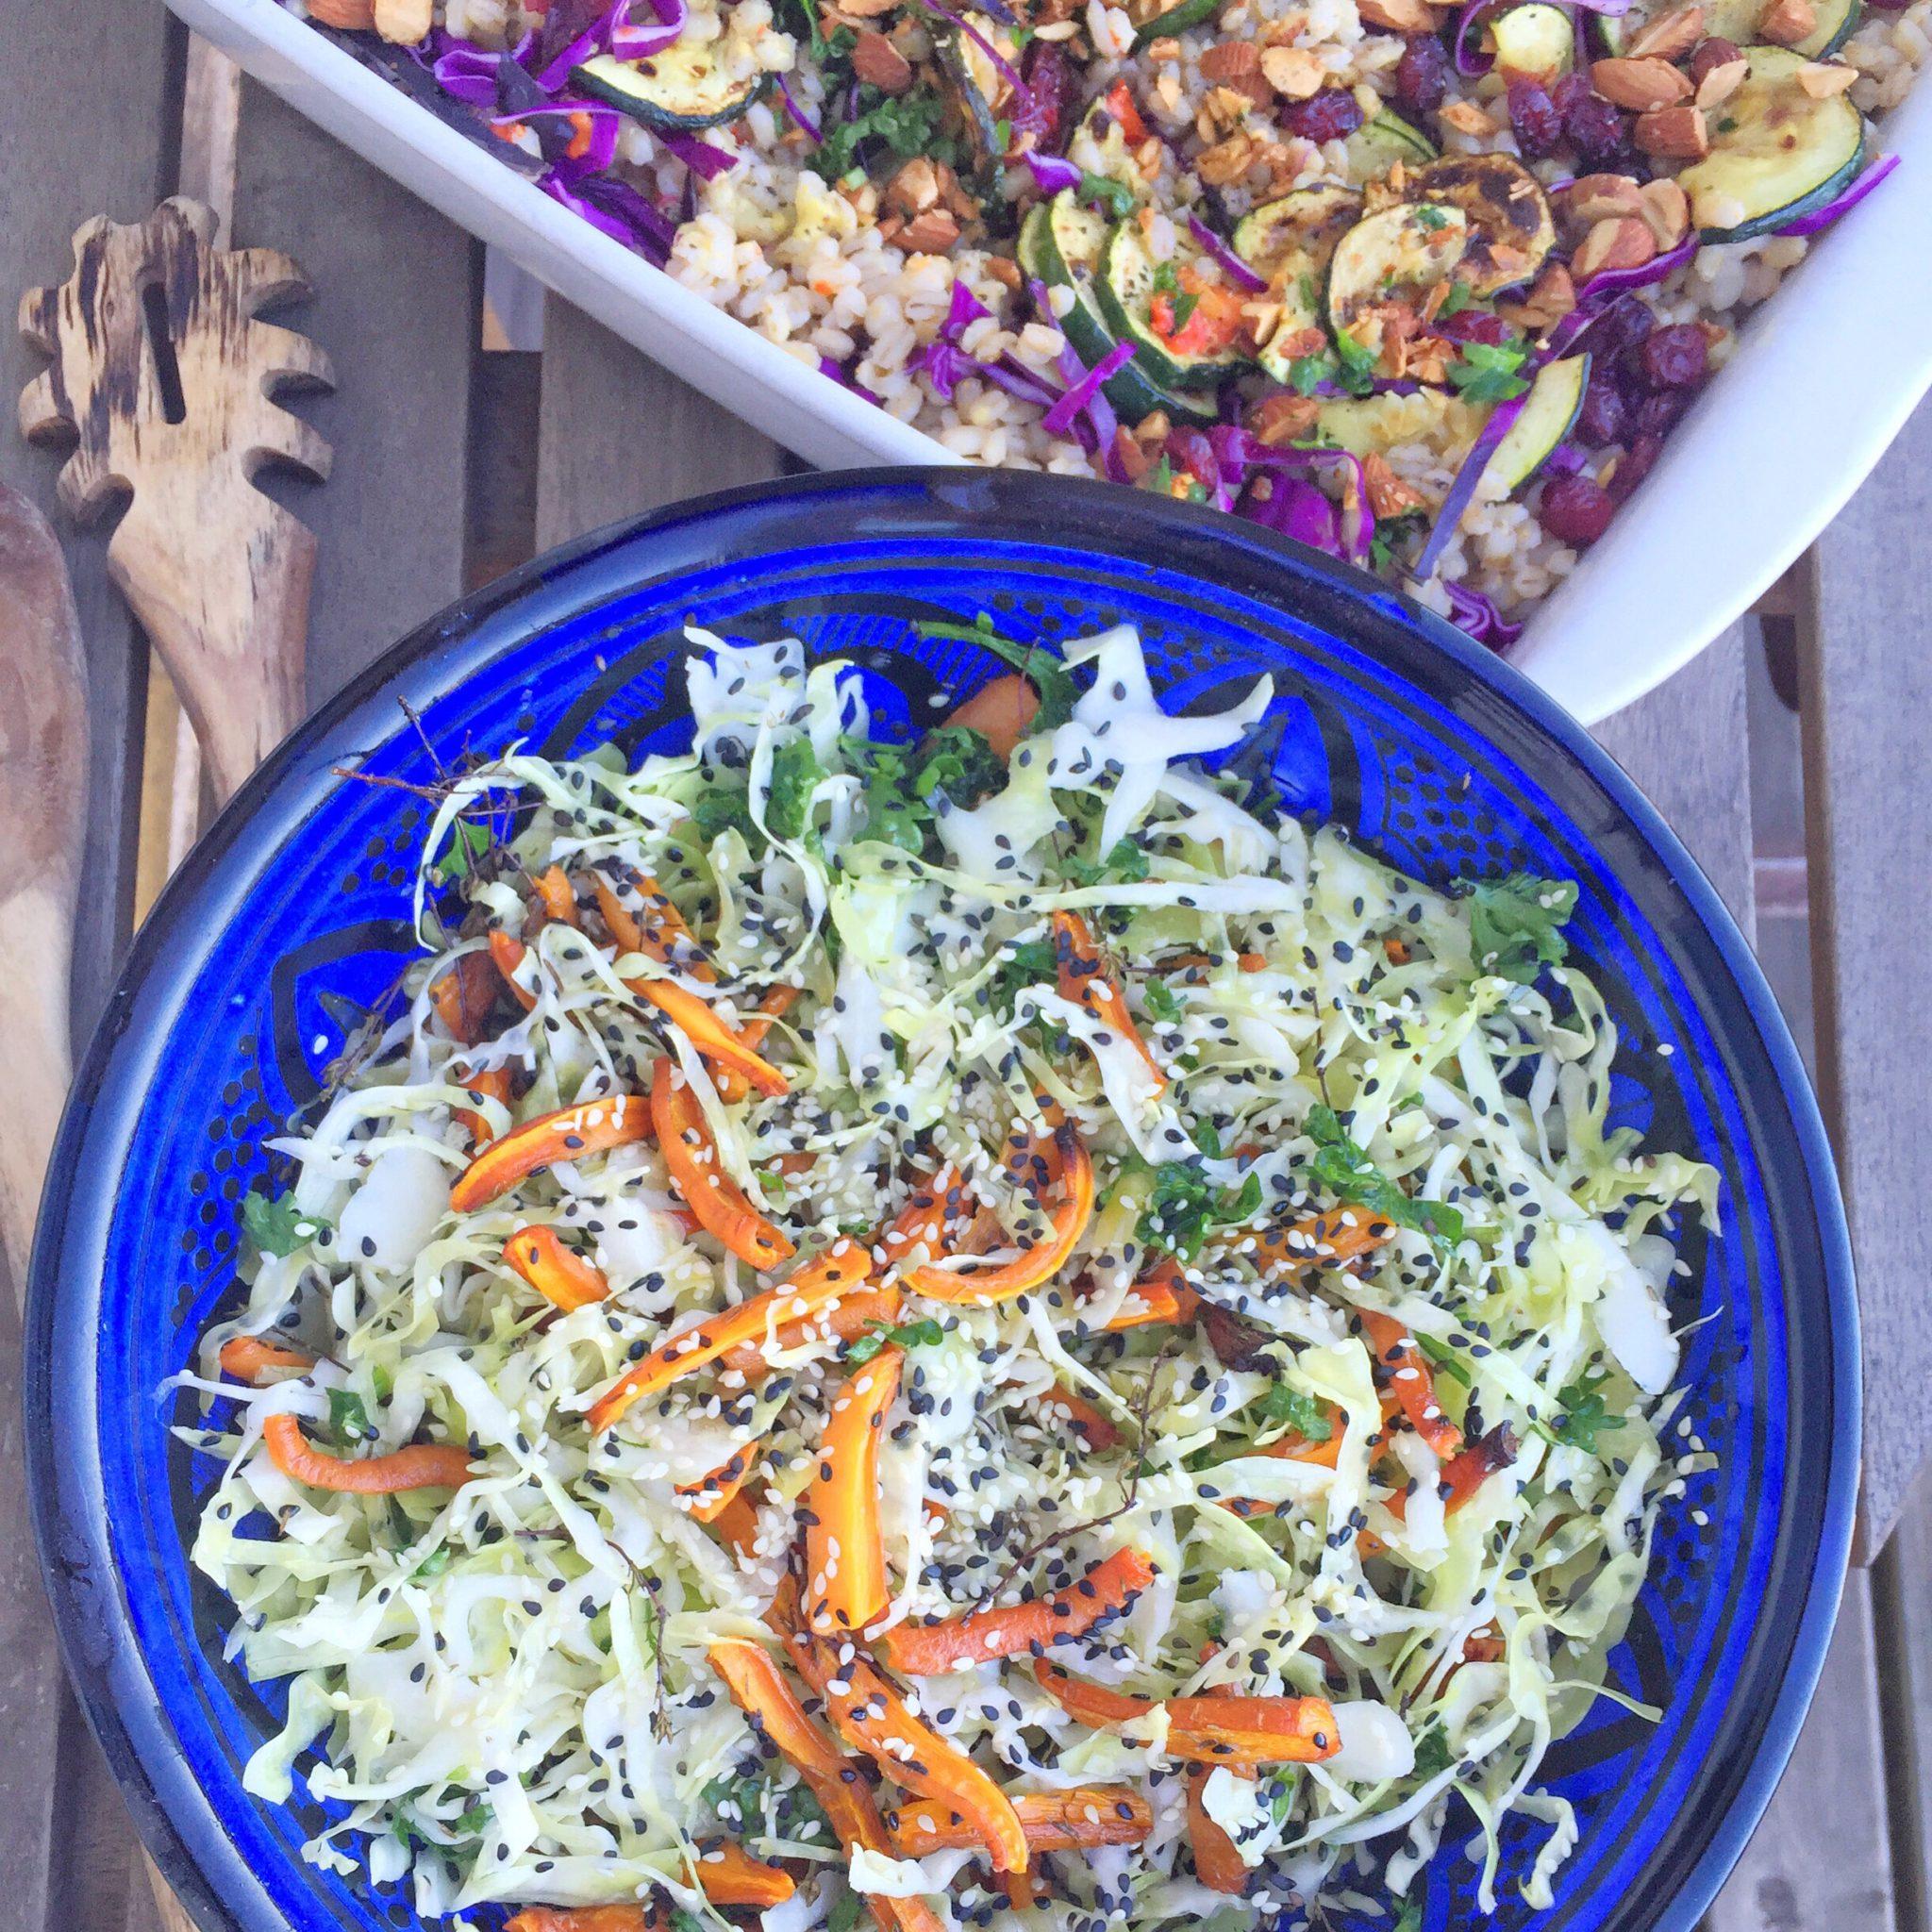 Blå skål med salat perfekt til fest med gulerødder og hvidkål